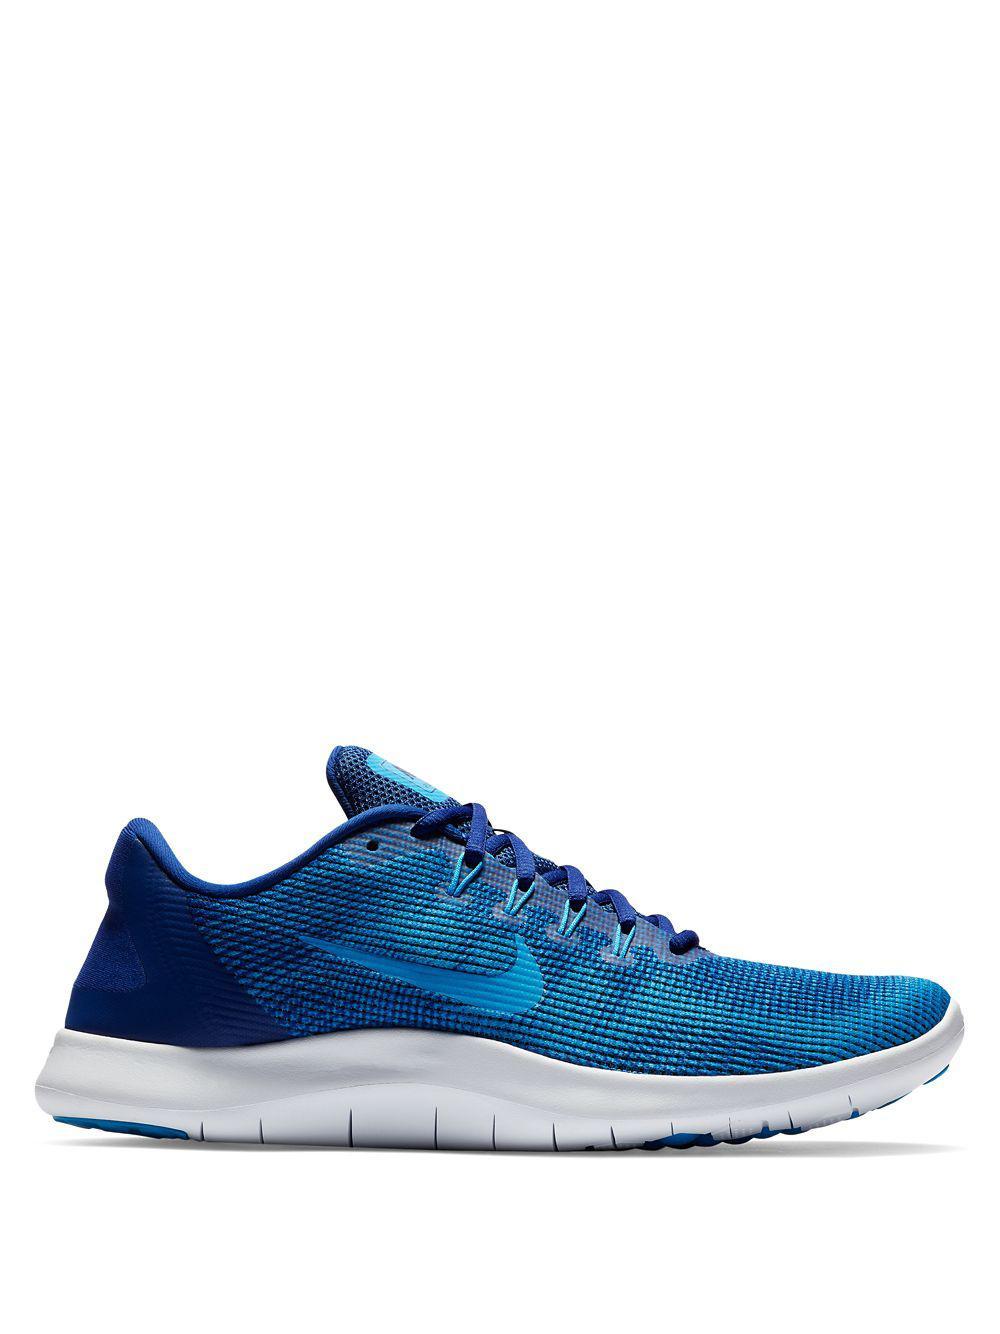 8d1da22412aa Lyst - Nike Flex Rn 2018 Running Shoes in Blue for Men